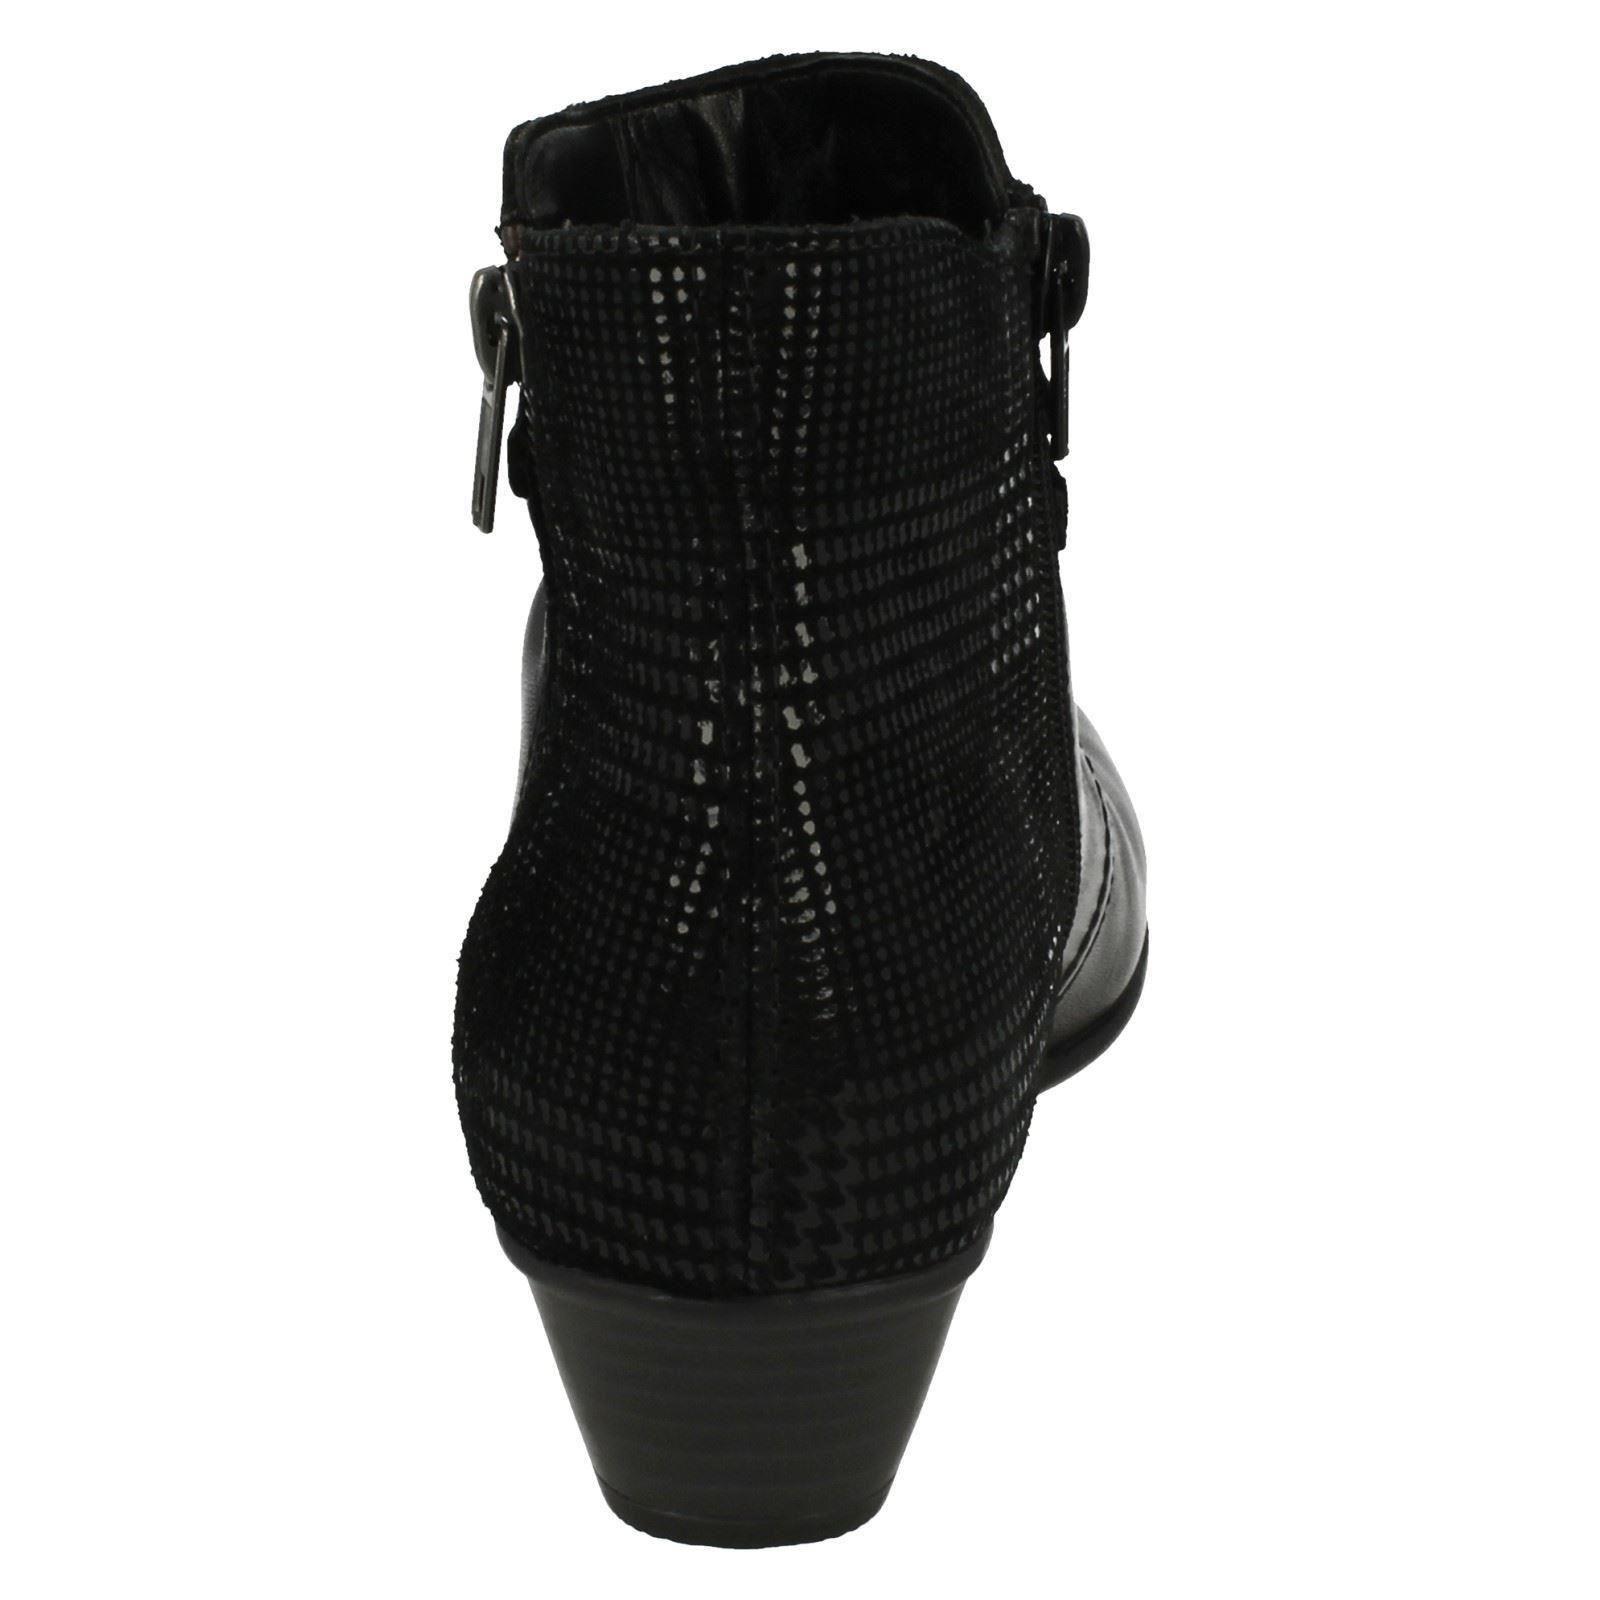 Ladies Remonte D7382 D7382 D7382 Heeled Ankle Boots 32a2cb